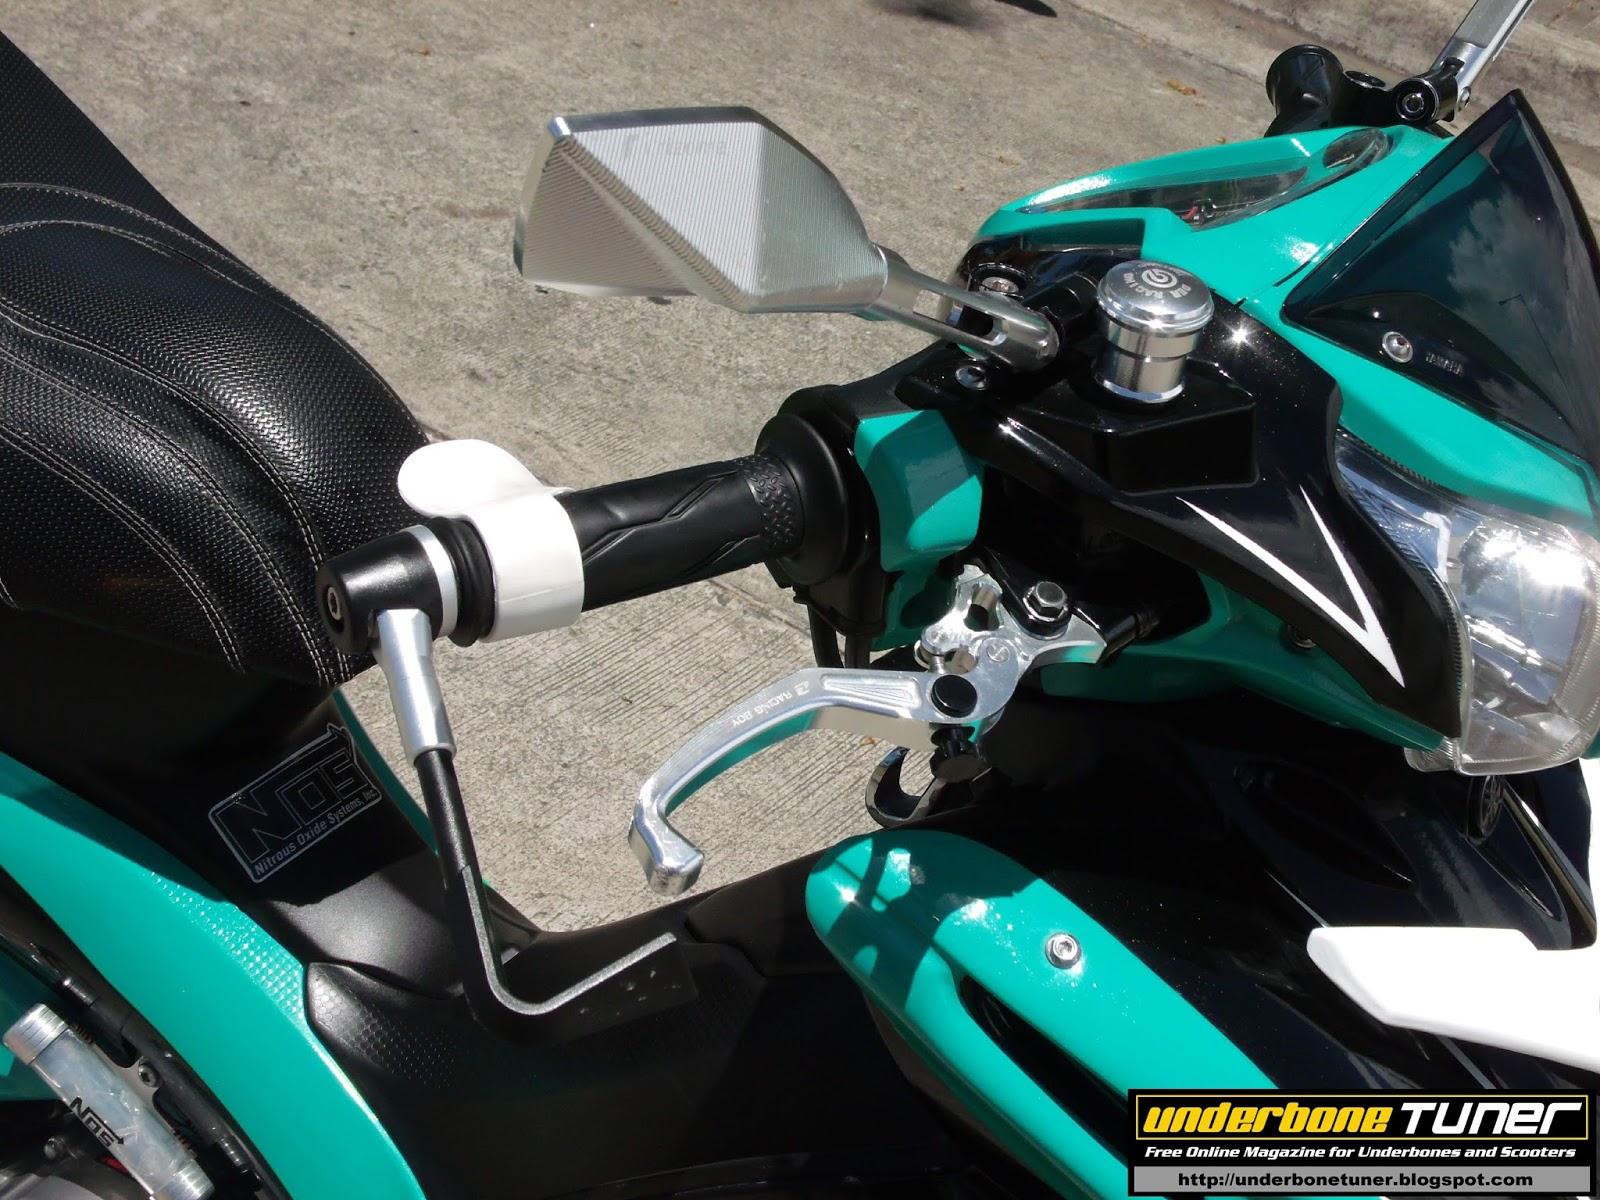 Underbone Tuner: Petronas Fomula 1 Team Inspired Modified